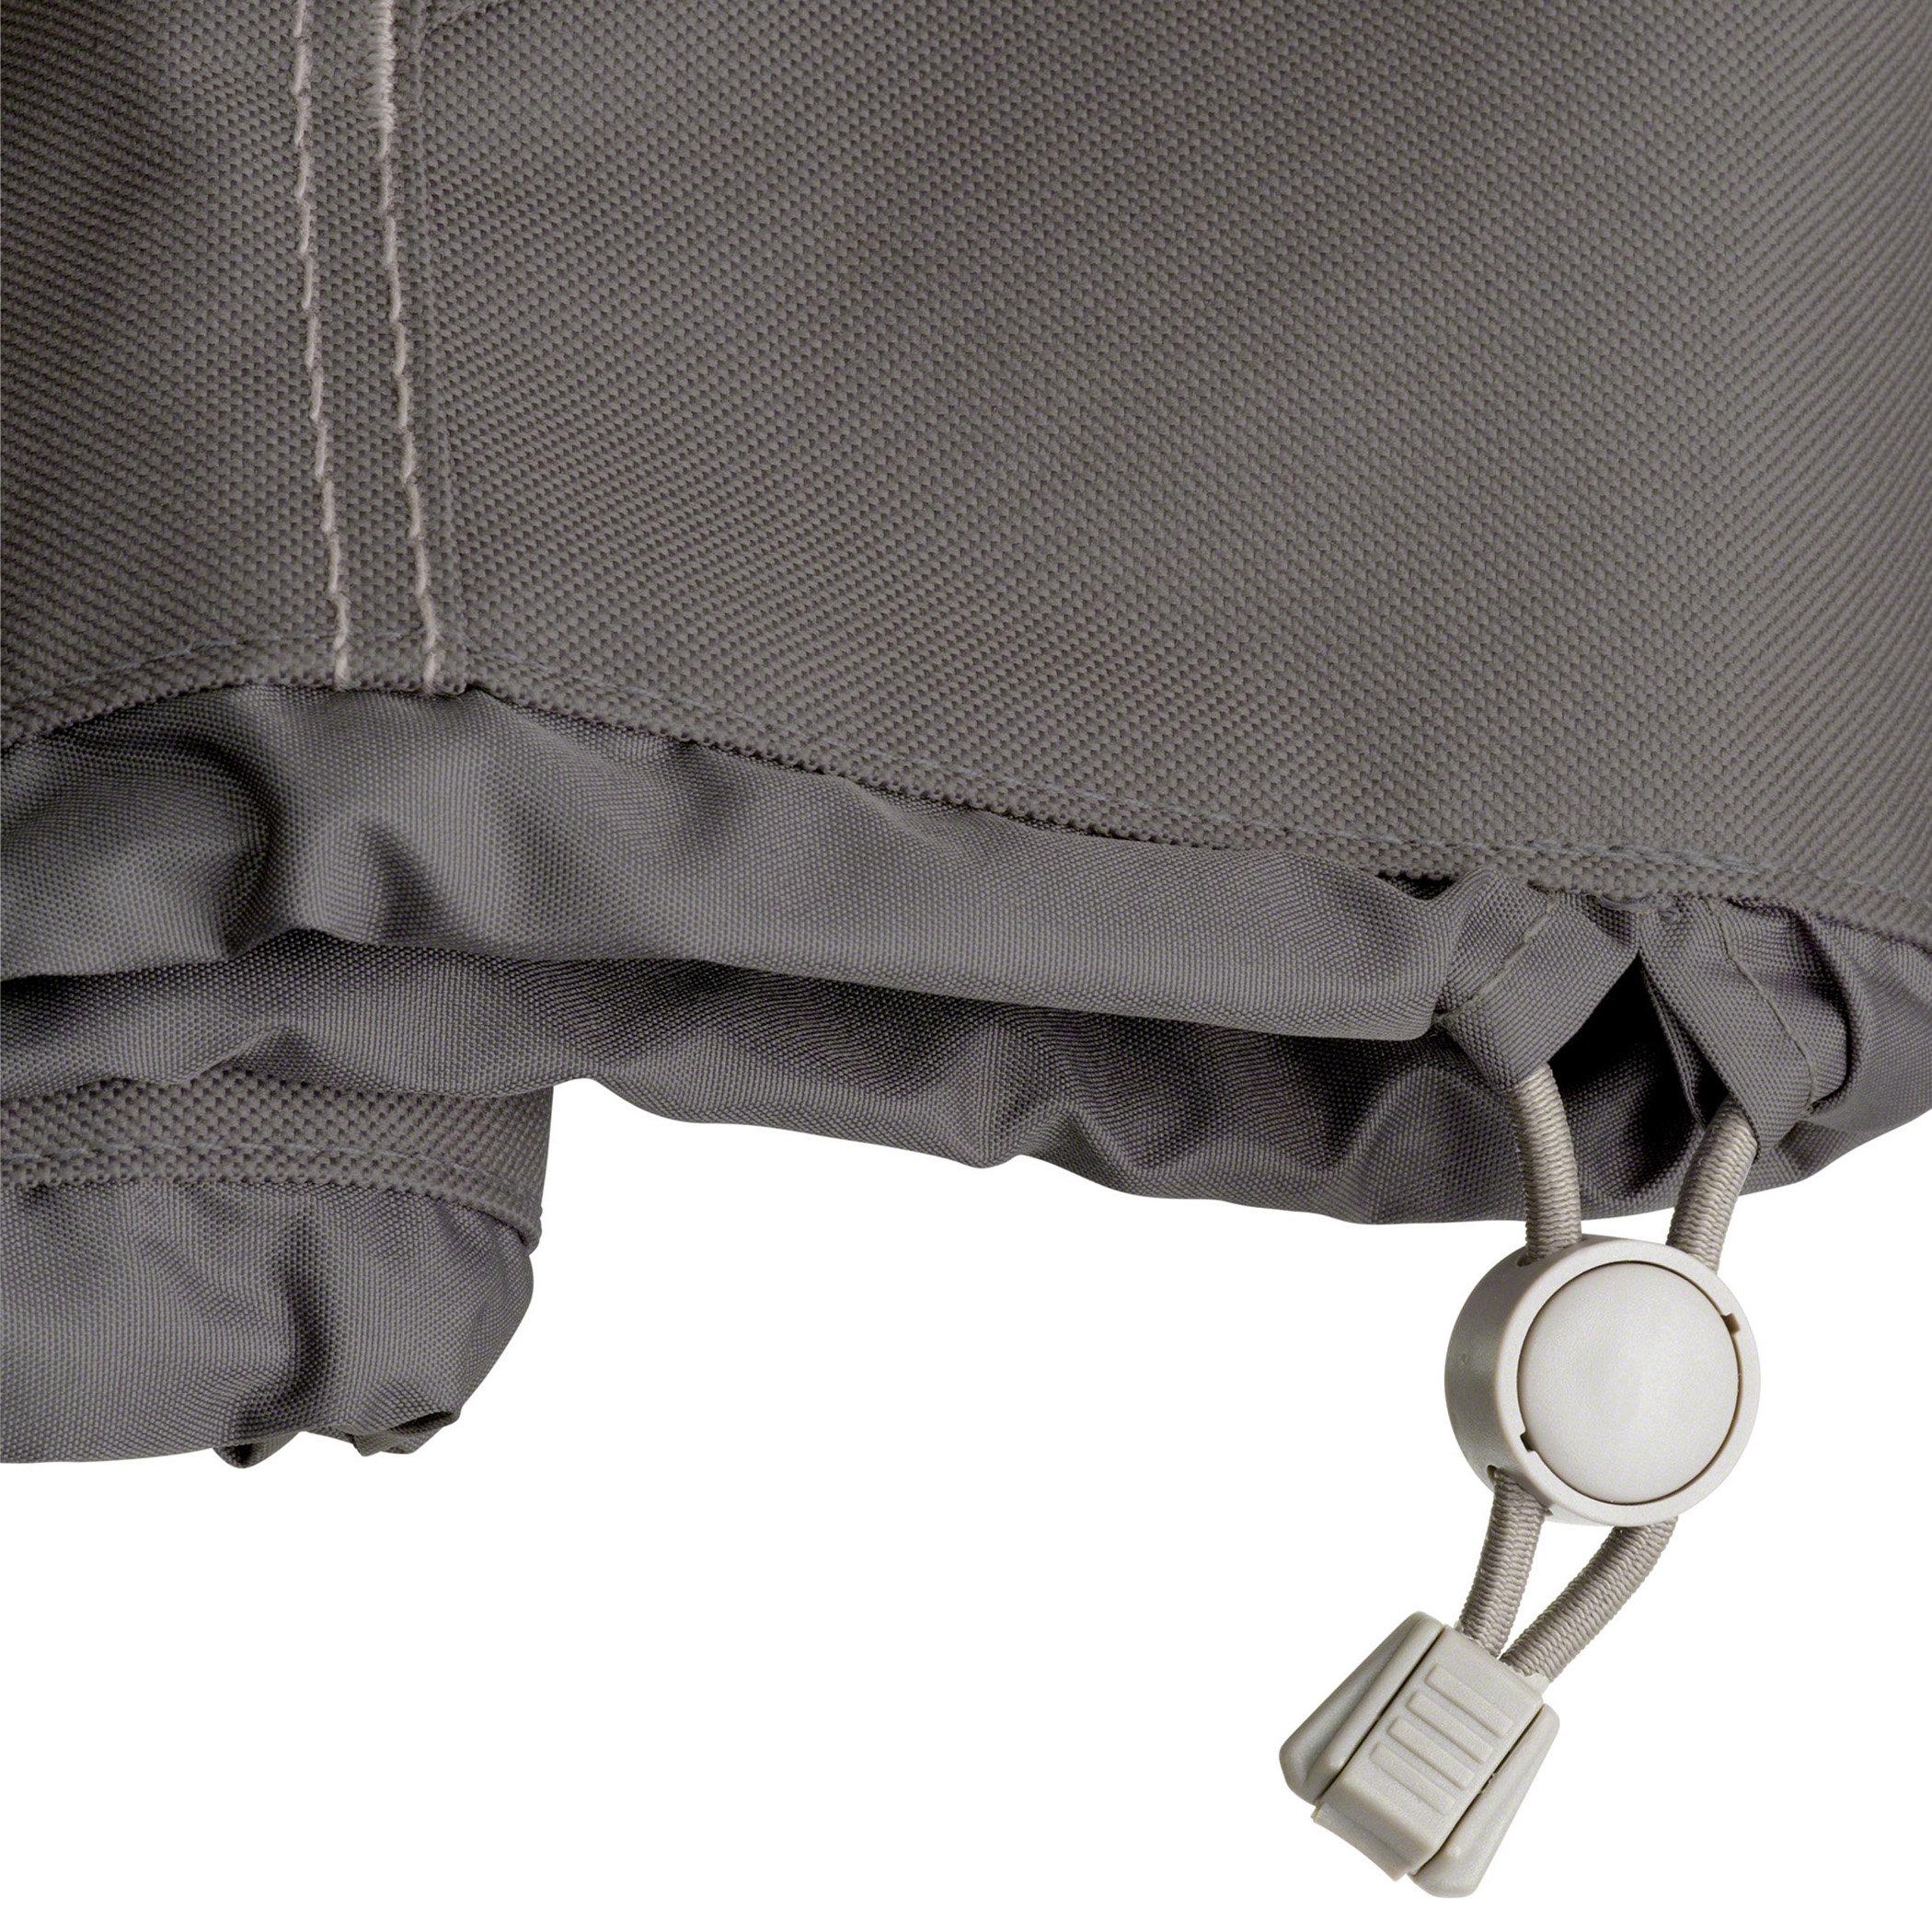 Amazon.com : Classic Accessories 55-163-045101-EC Ravenna